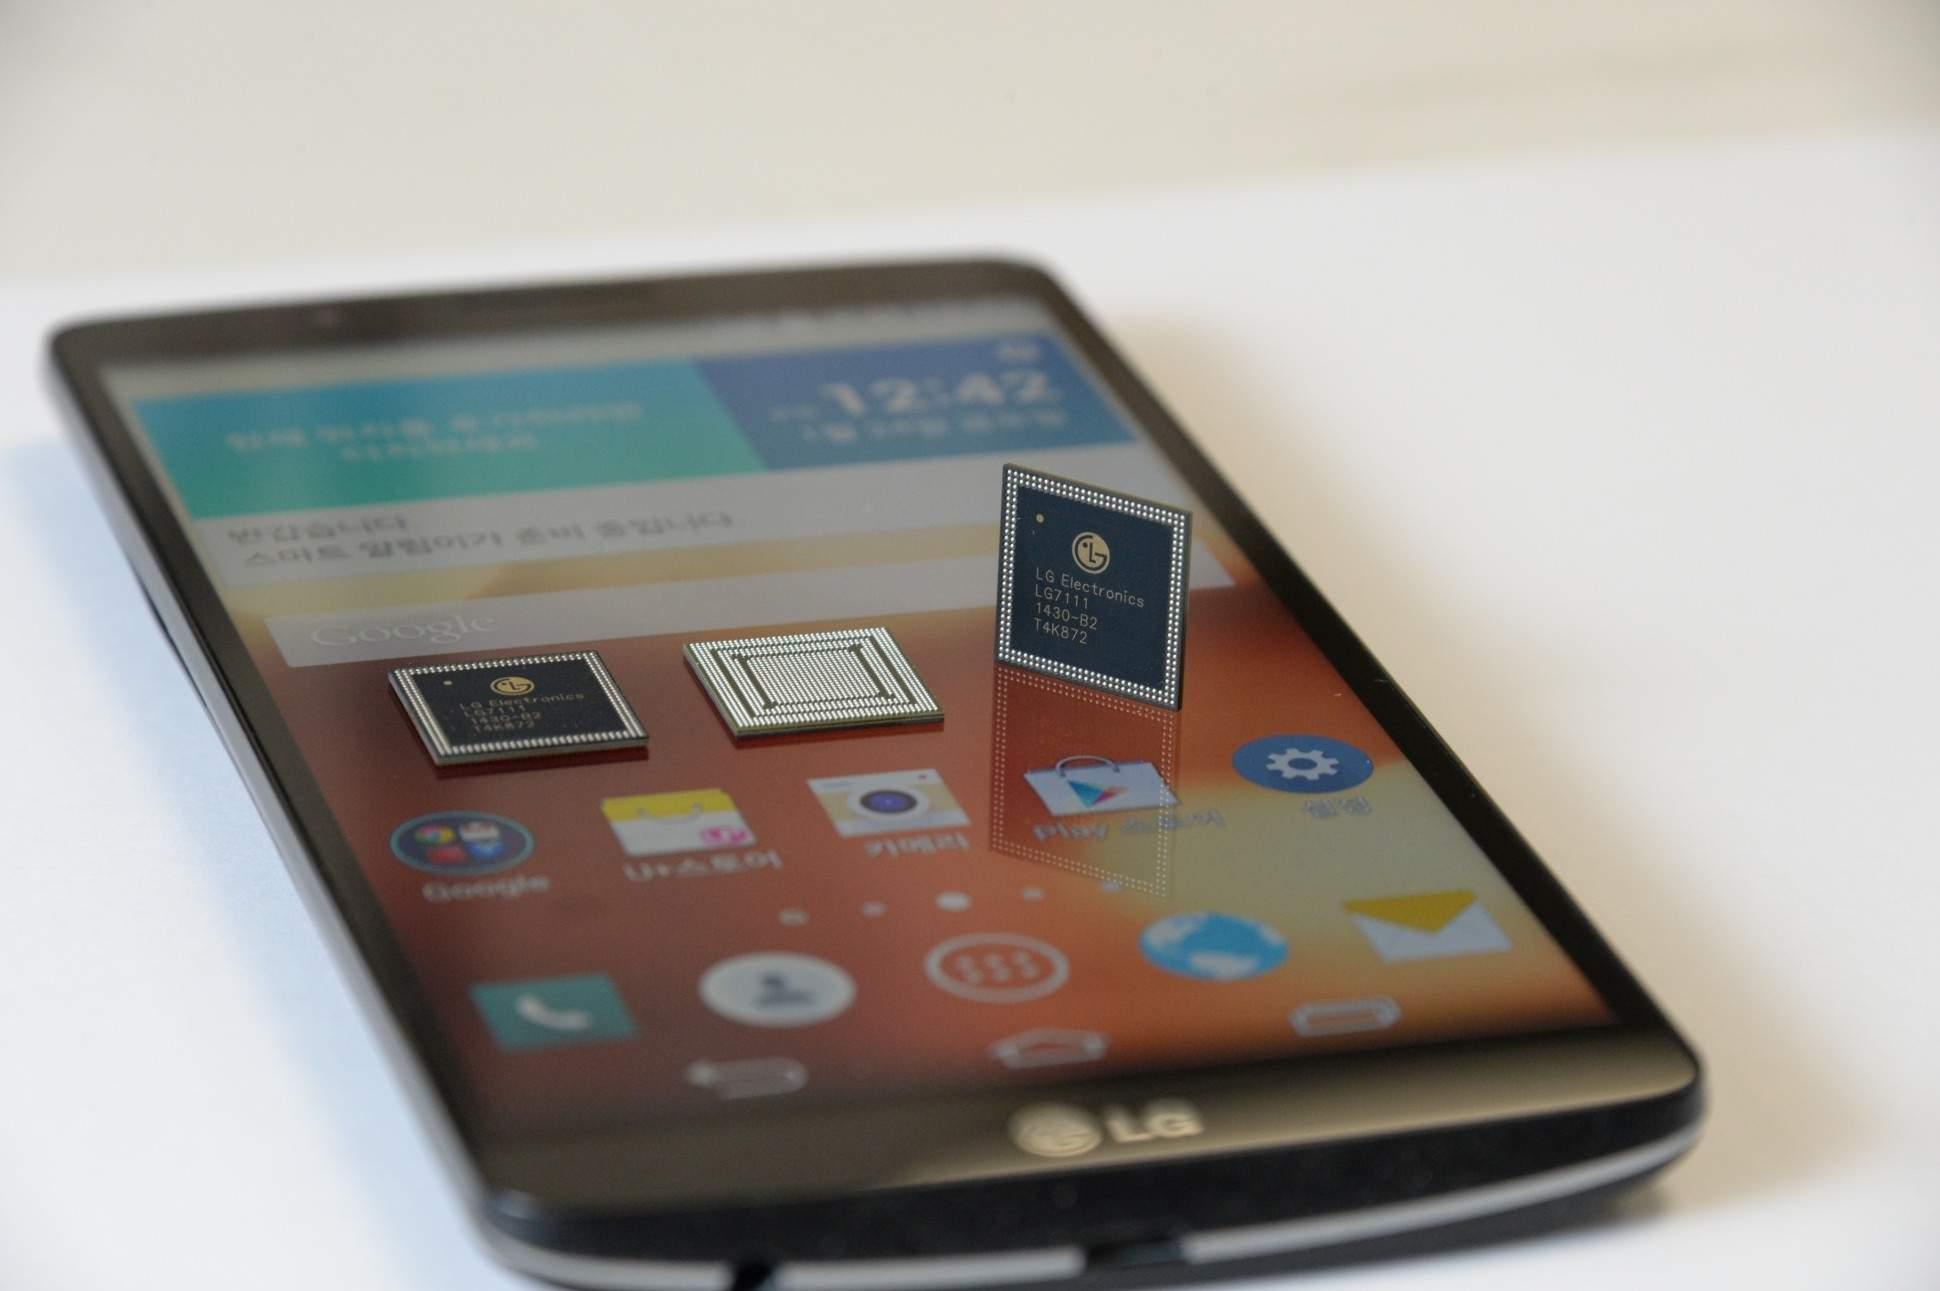 LG G3 Screen